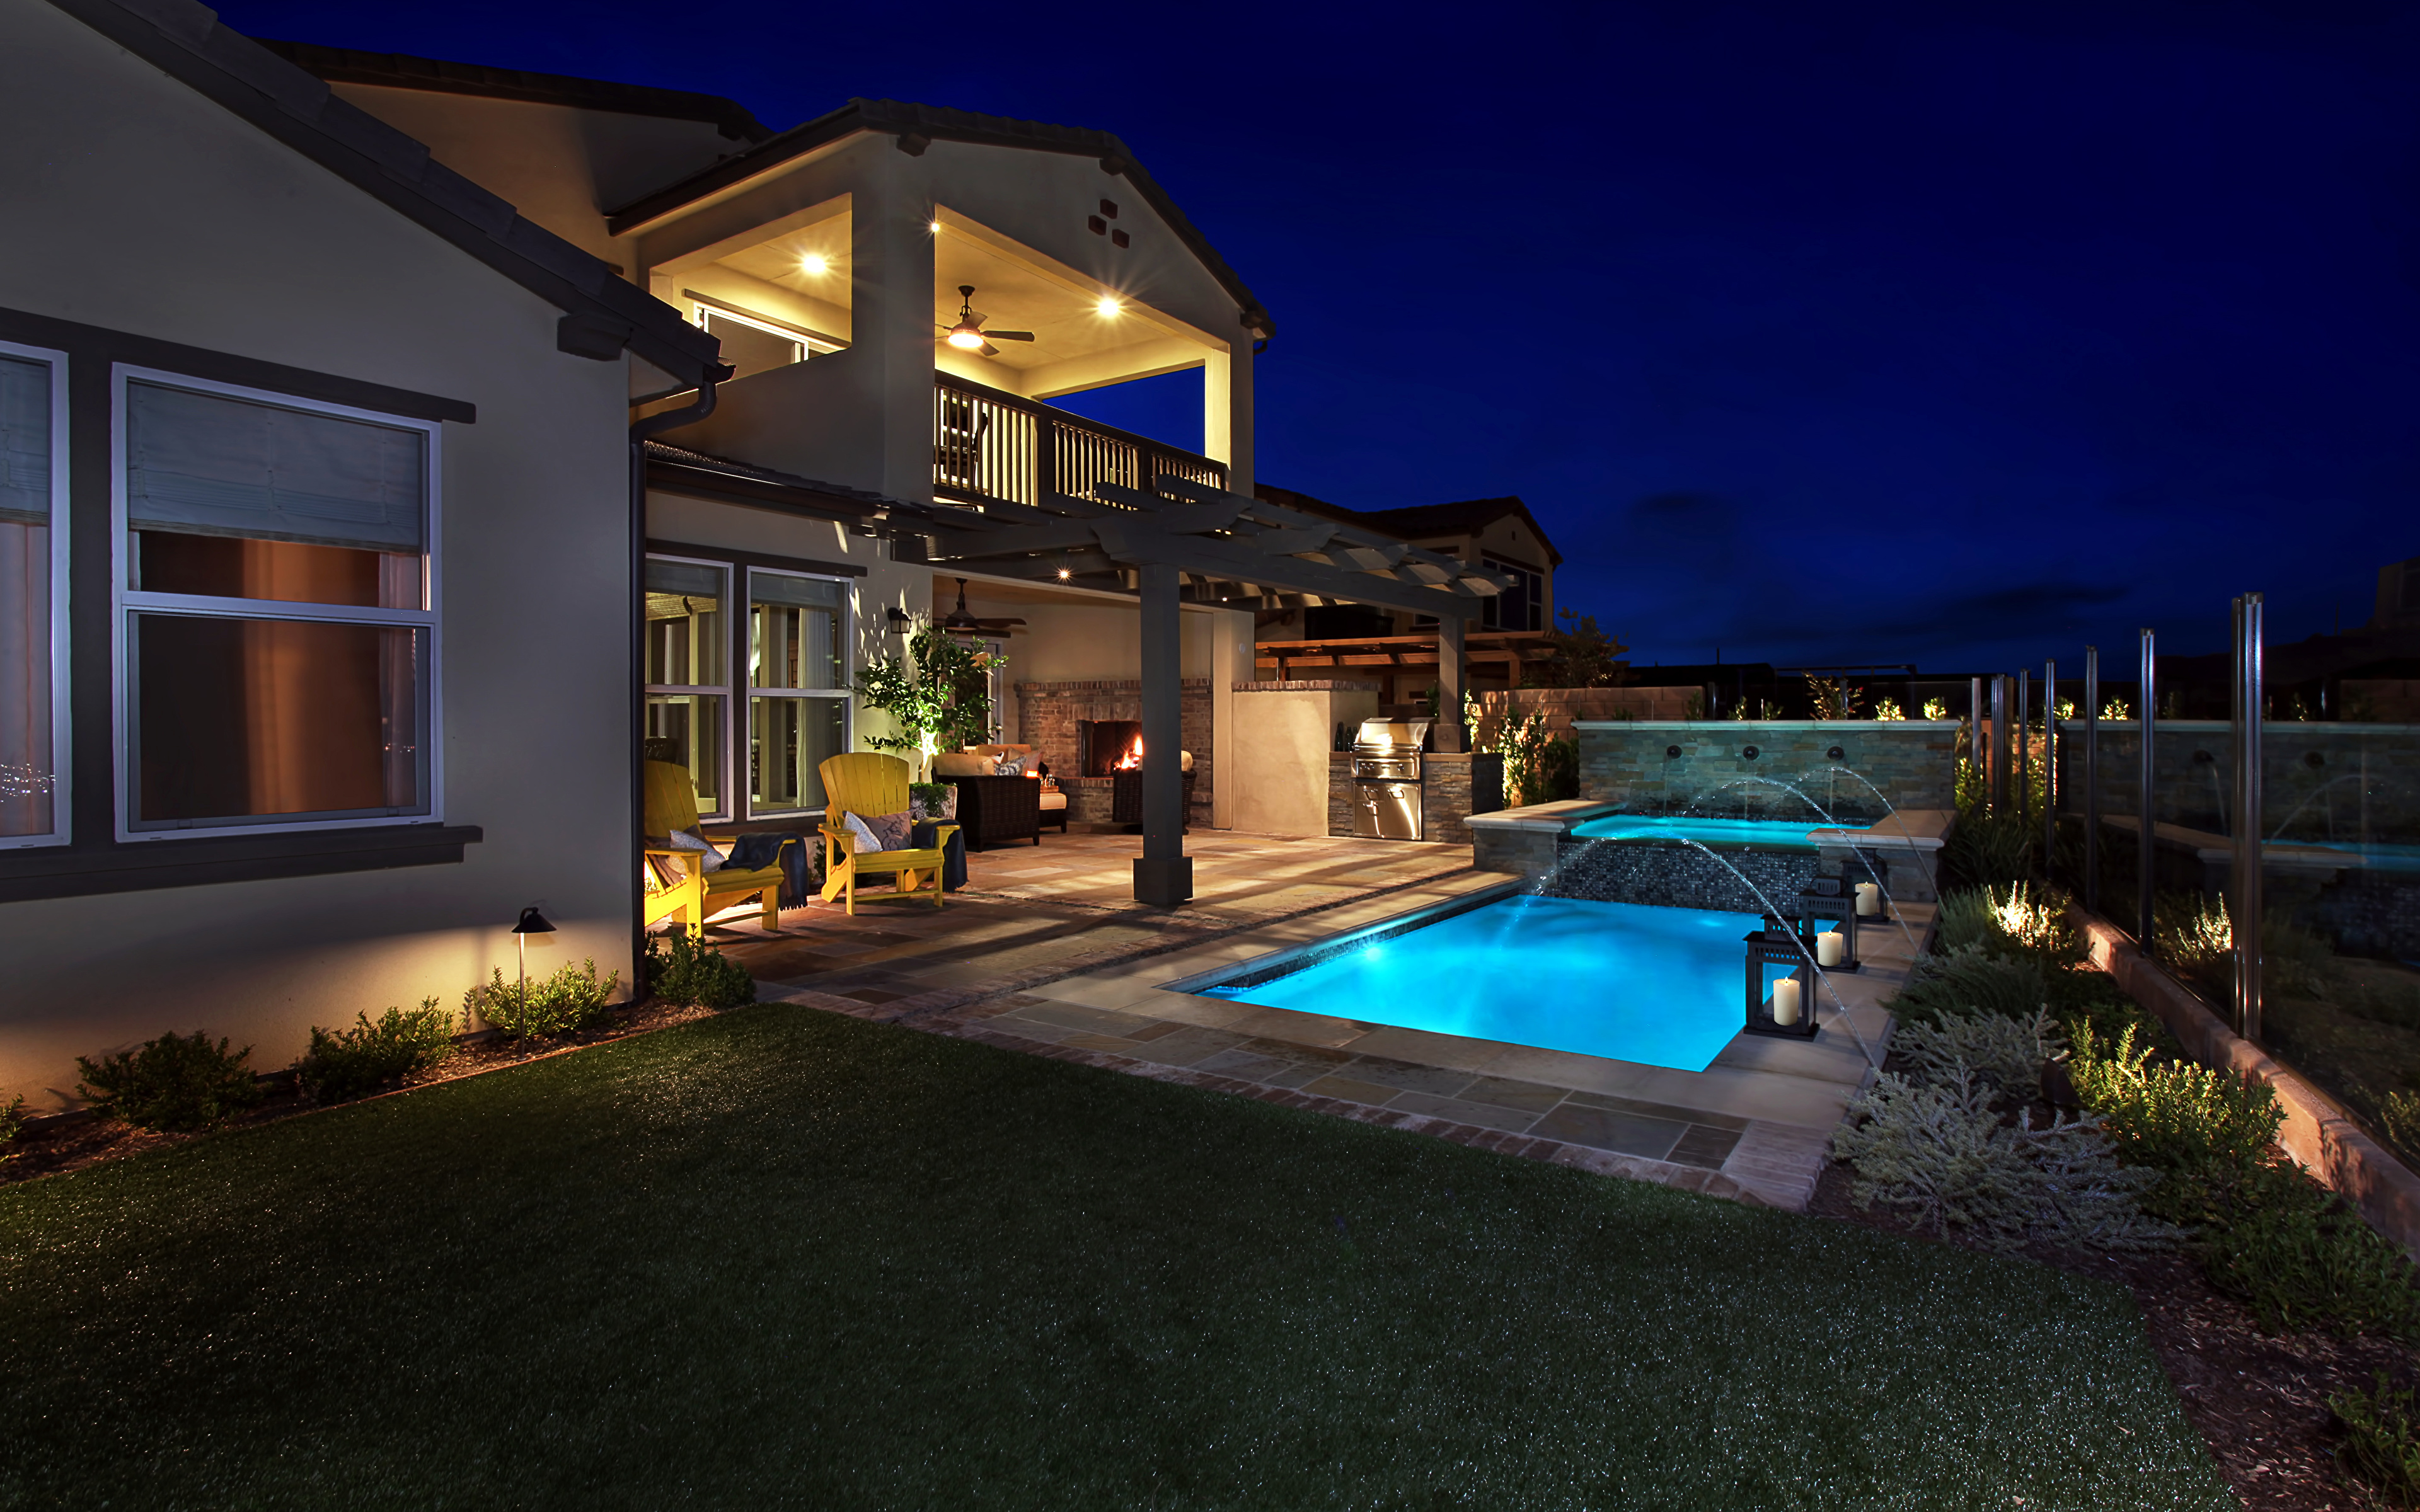 бассейн ночь pool night загрузить